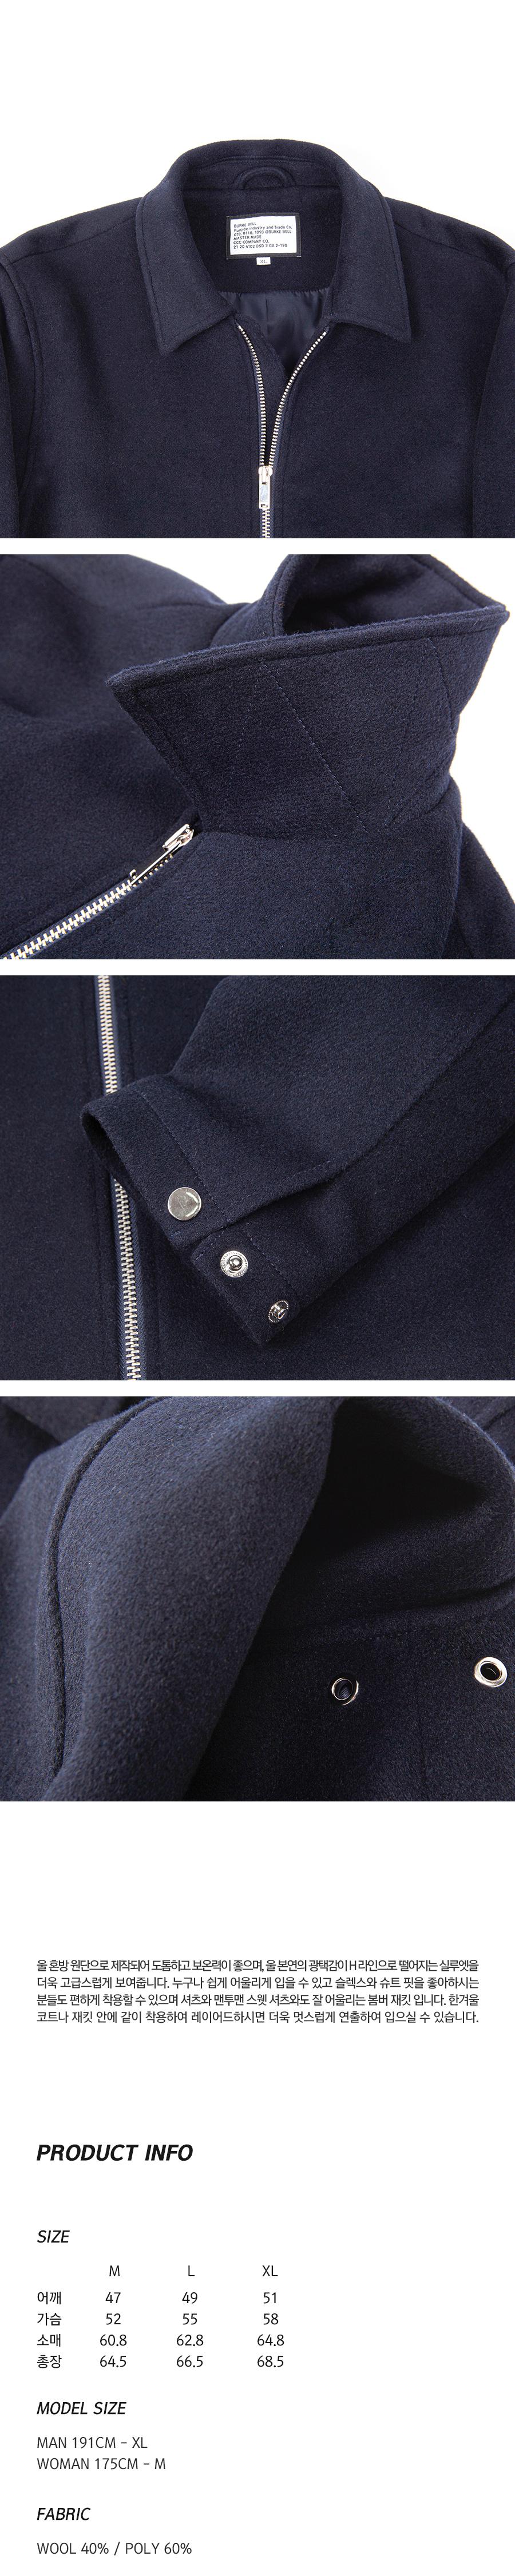 jacket_navy_03.jpg